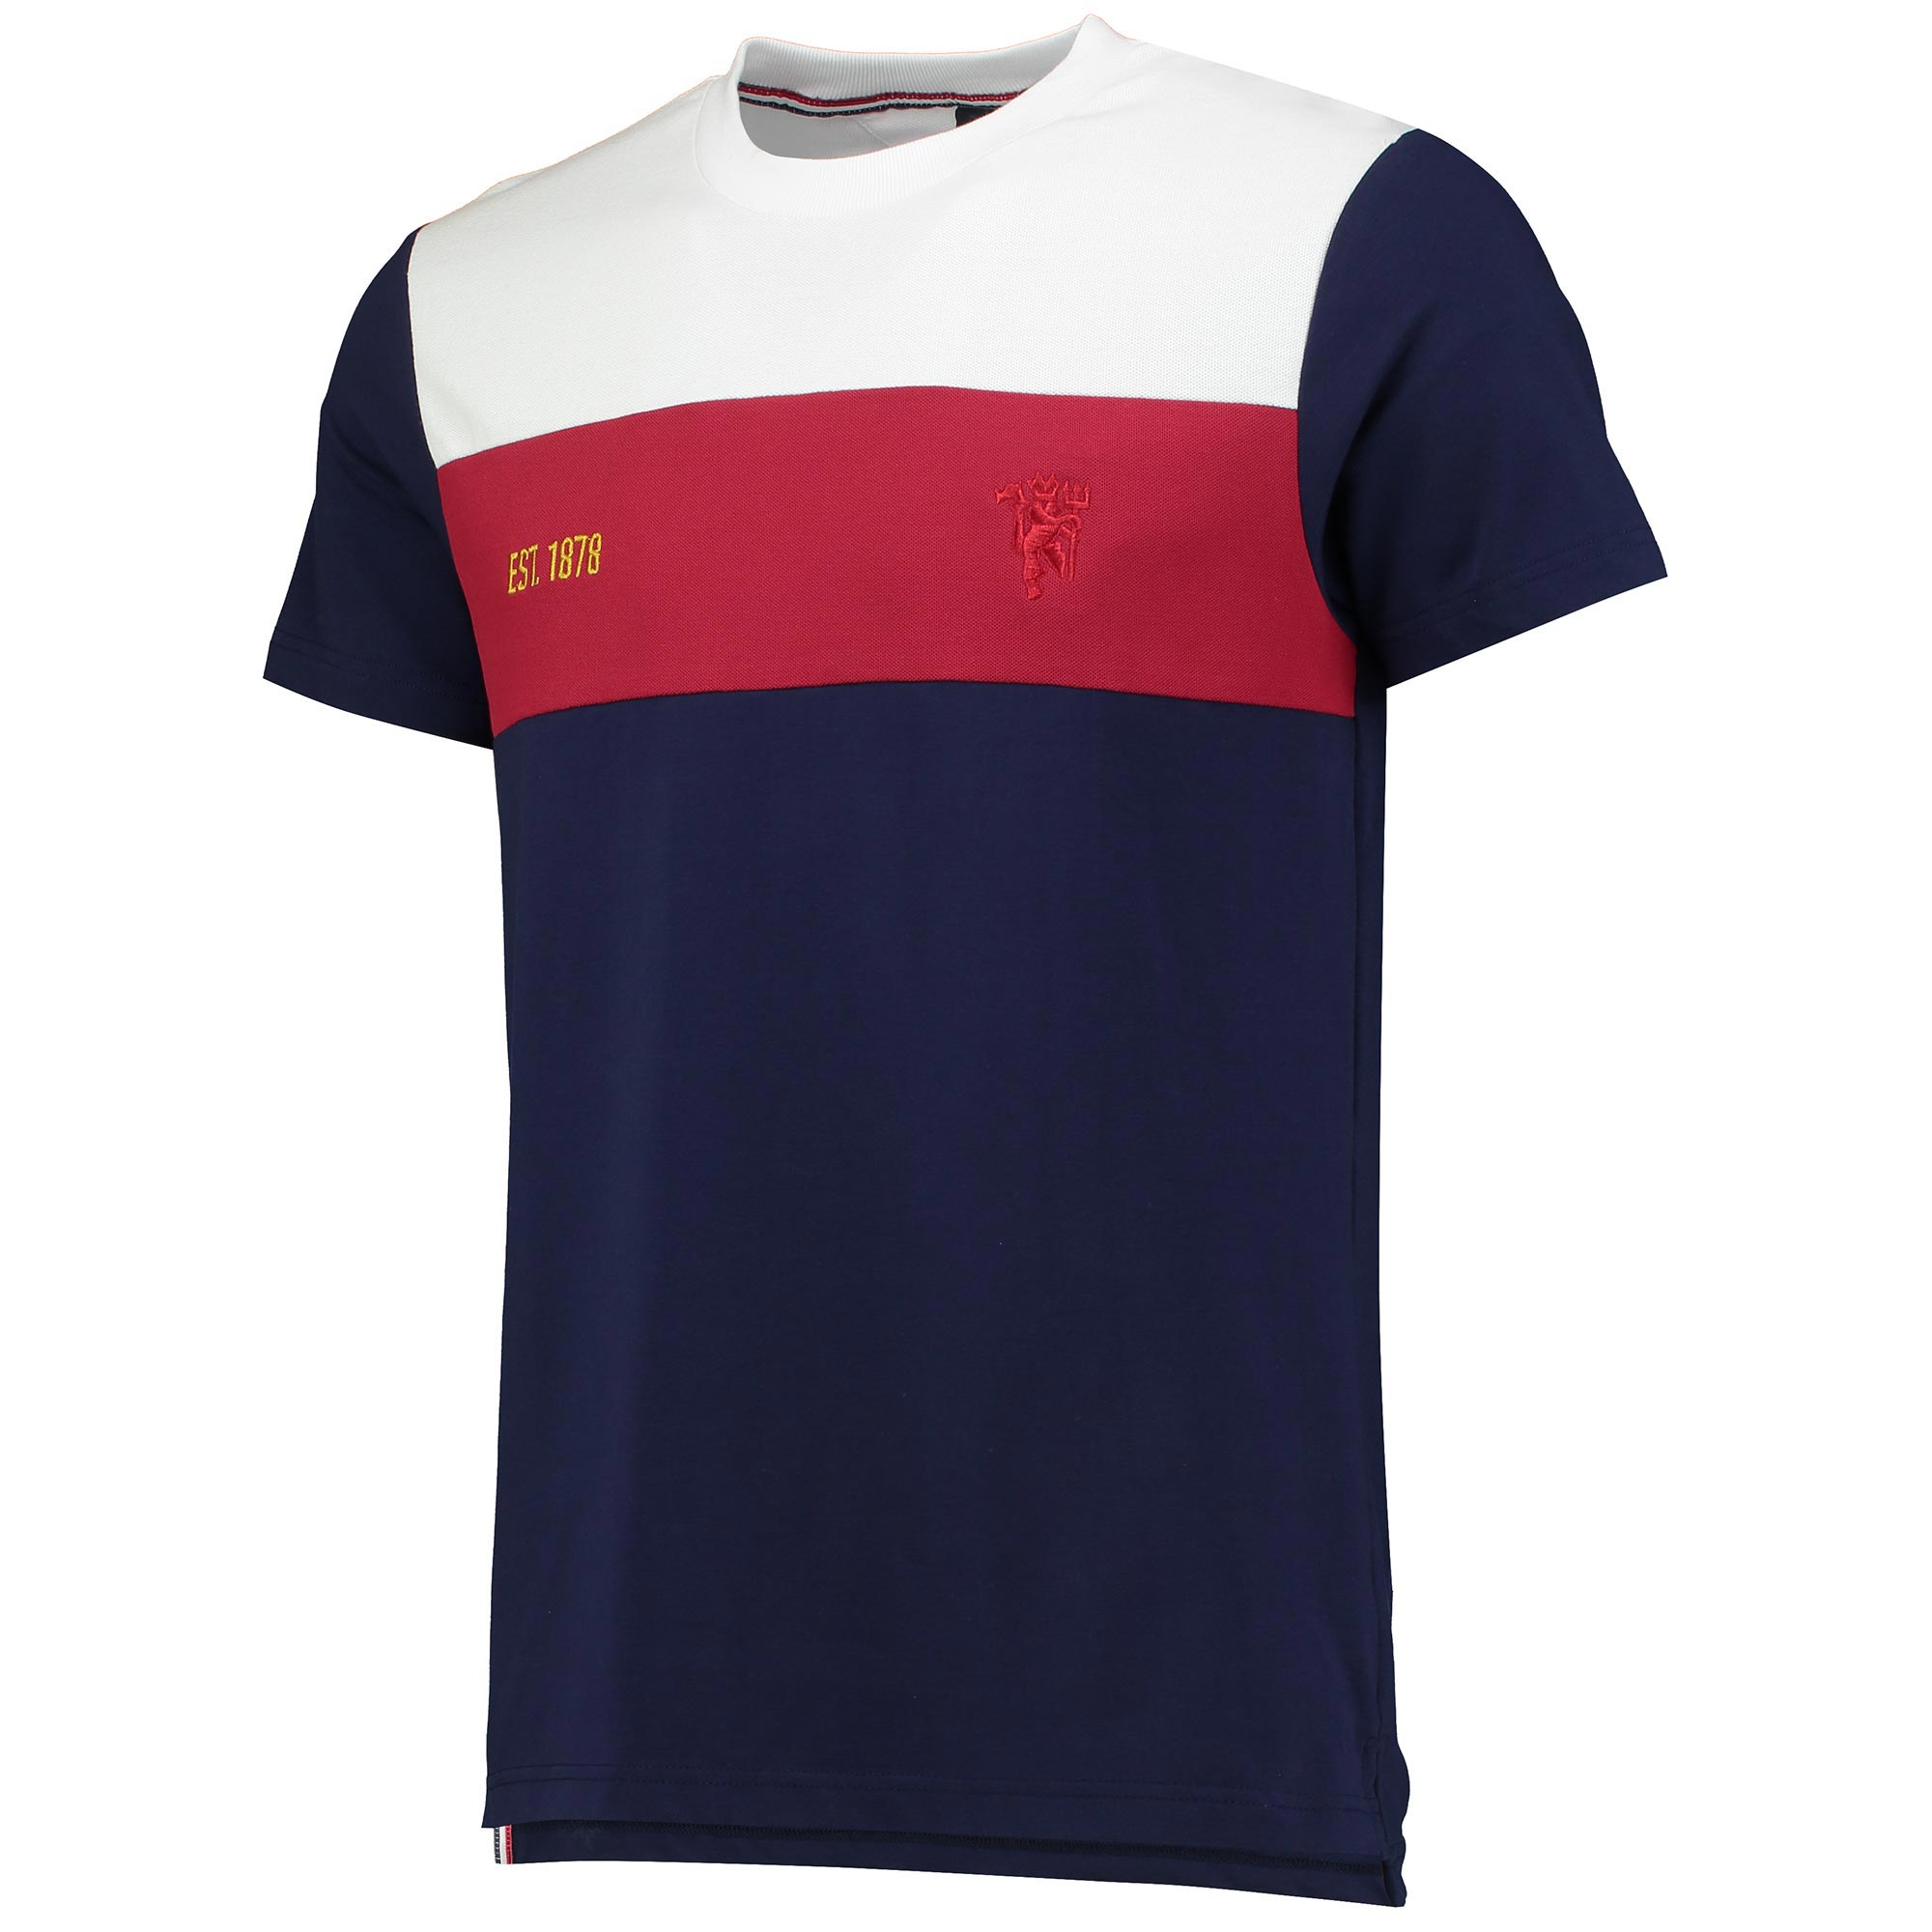 Manchester United Premium Devil Panelled T-Shirt - Navy - Mens